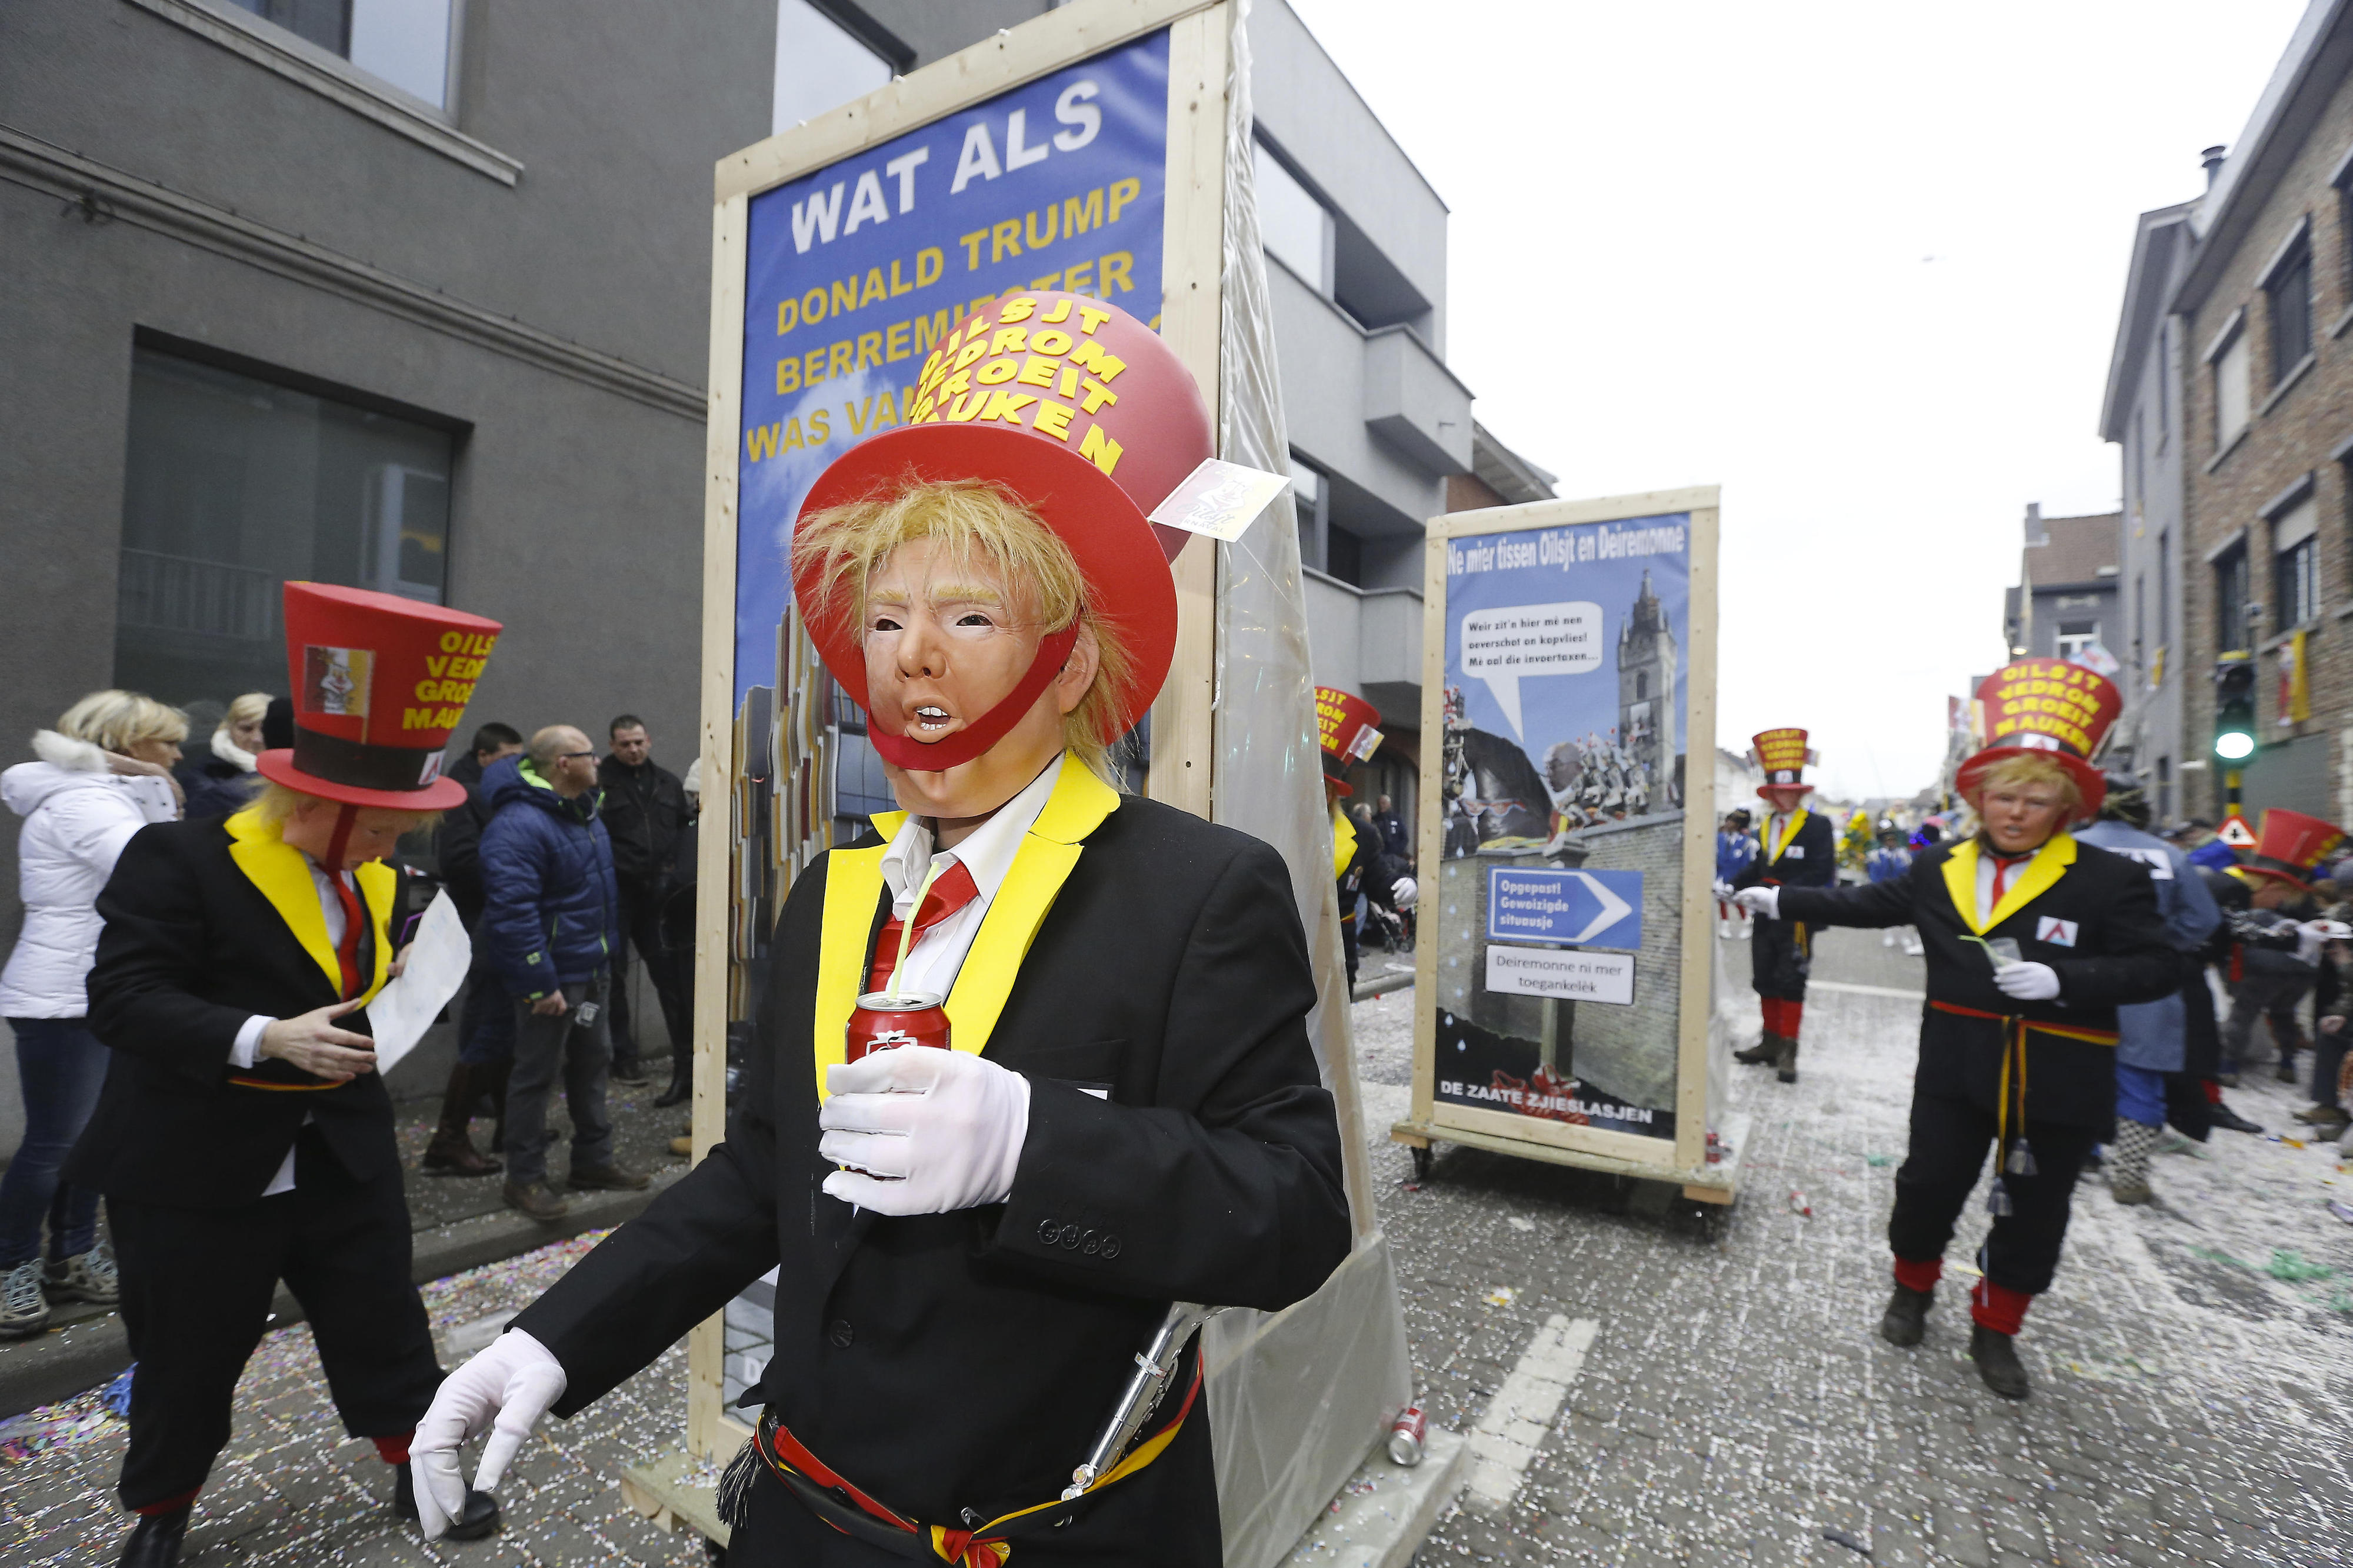 Um carnaval que se leva a mal. UNESCO remove festival belga de Aalst da lista de patrimónios por antissemitismo